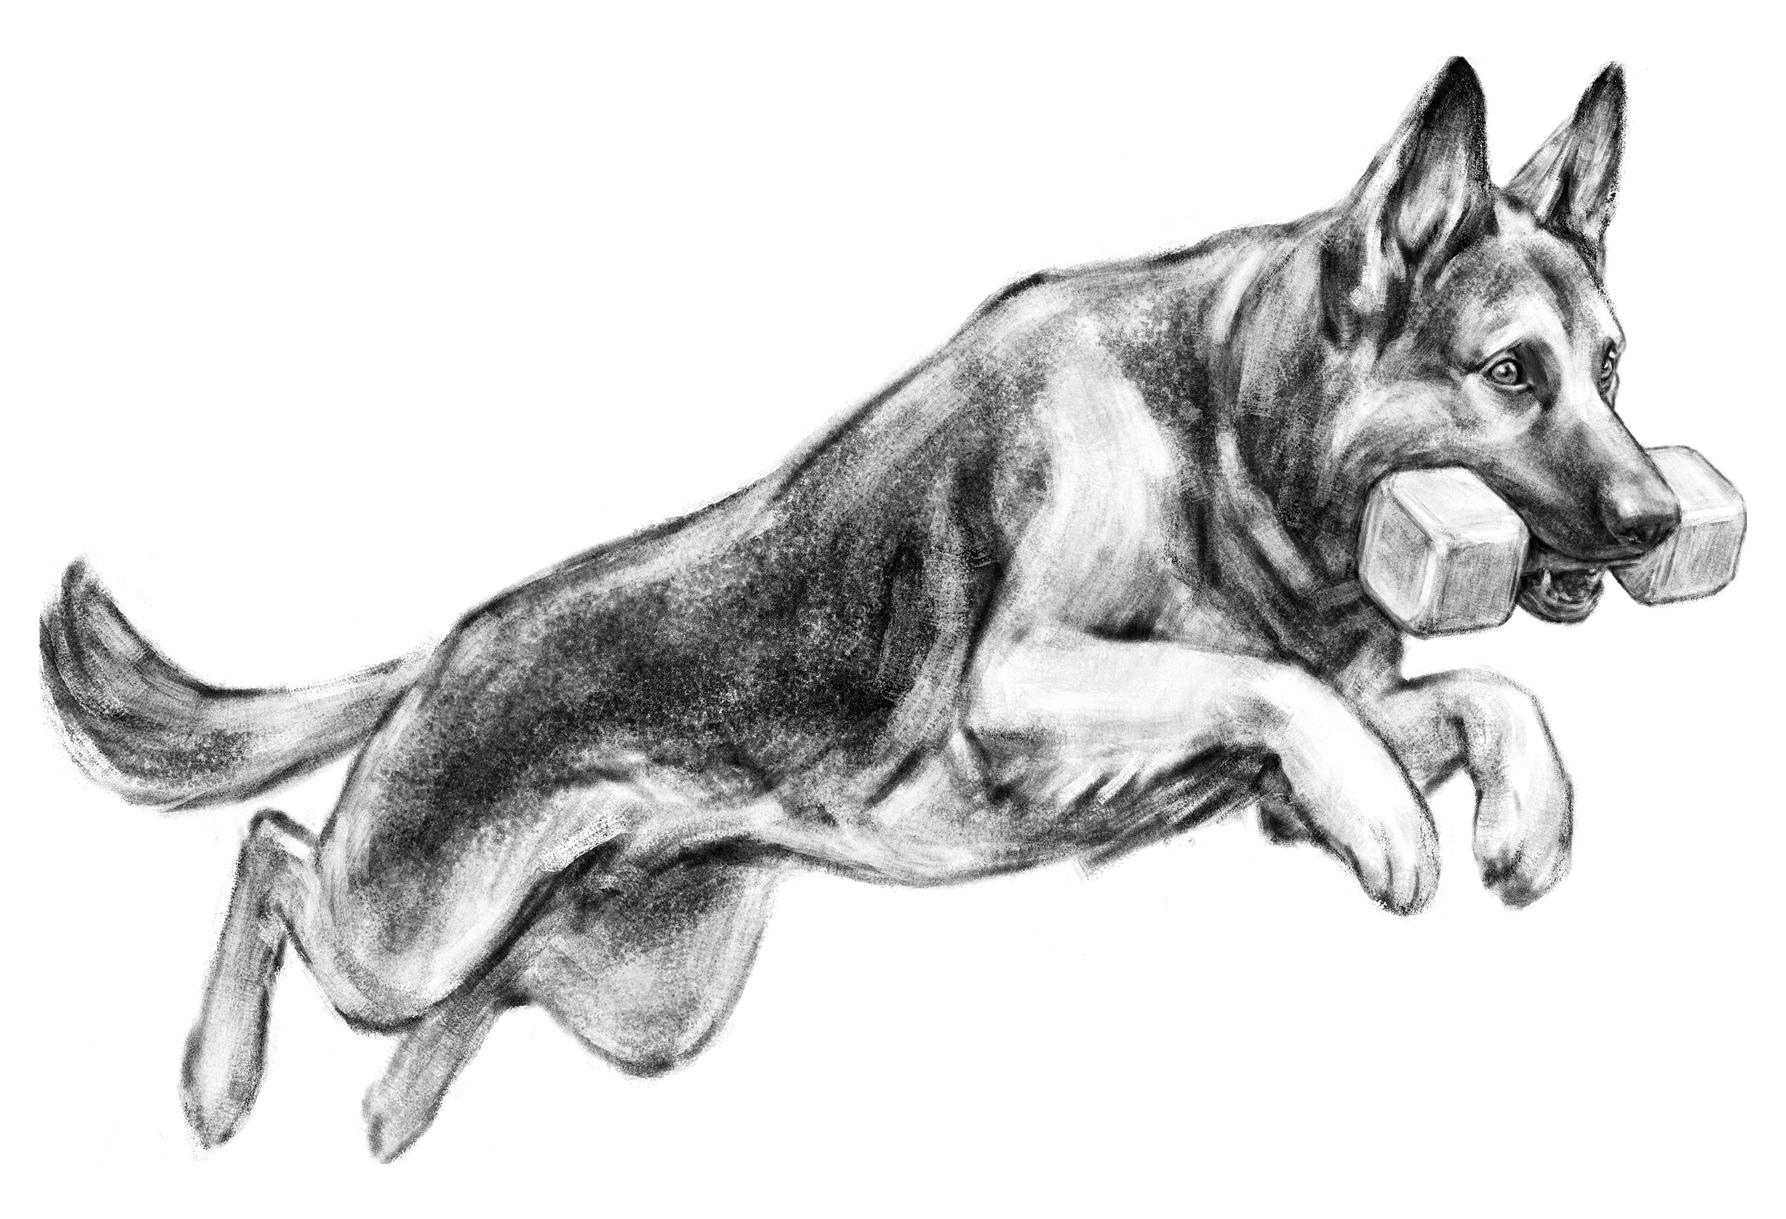 Dog Sport inspired Illustration